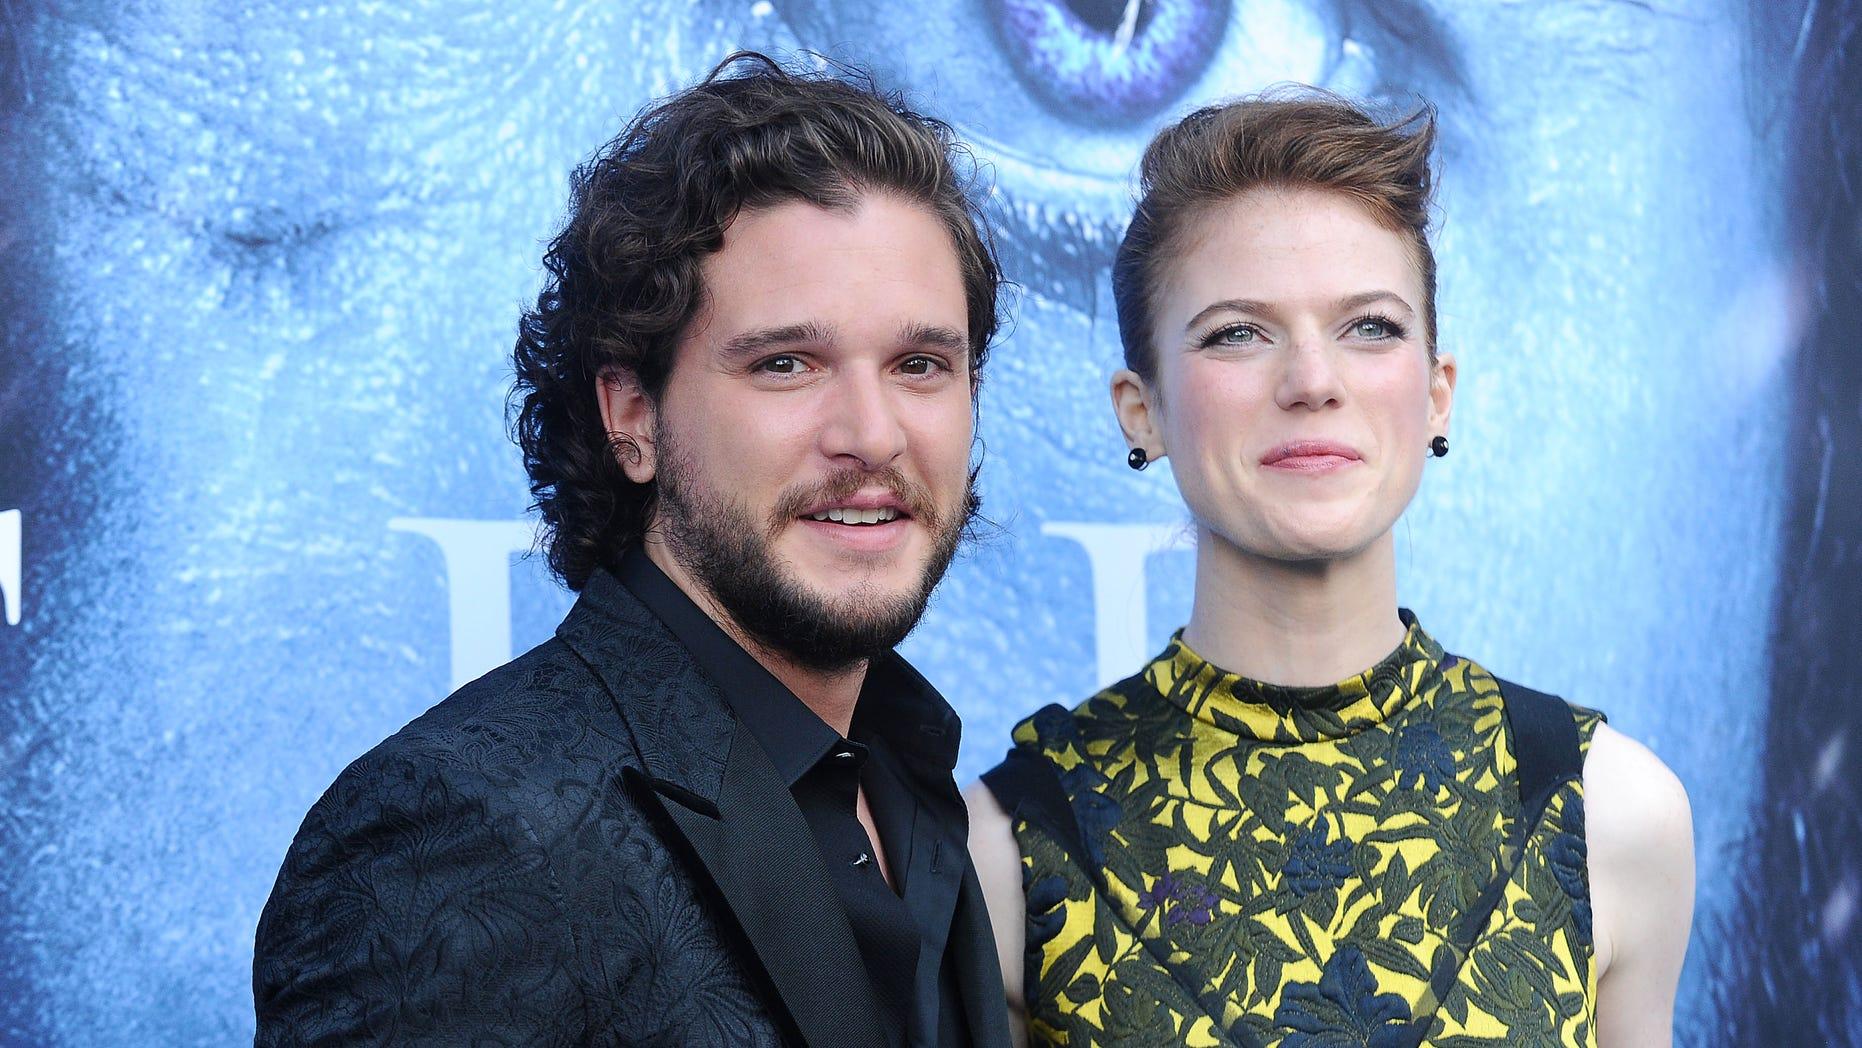 'Game of Thrones' actor Kit Harington denied cheating rumors.